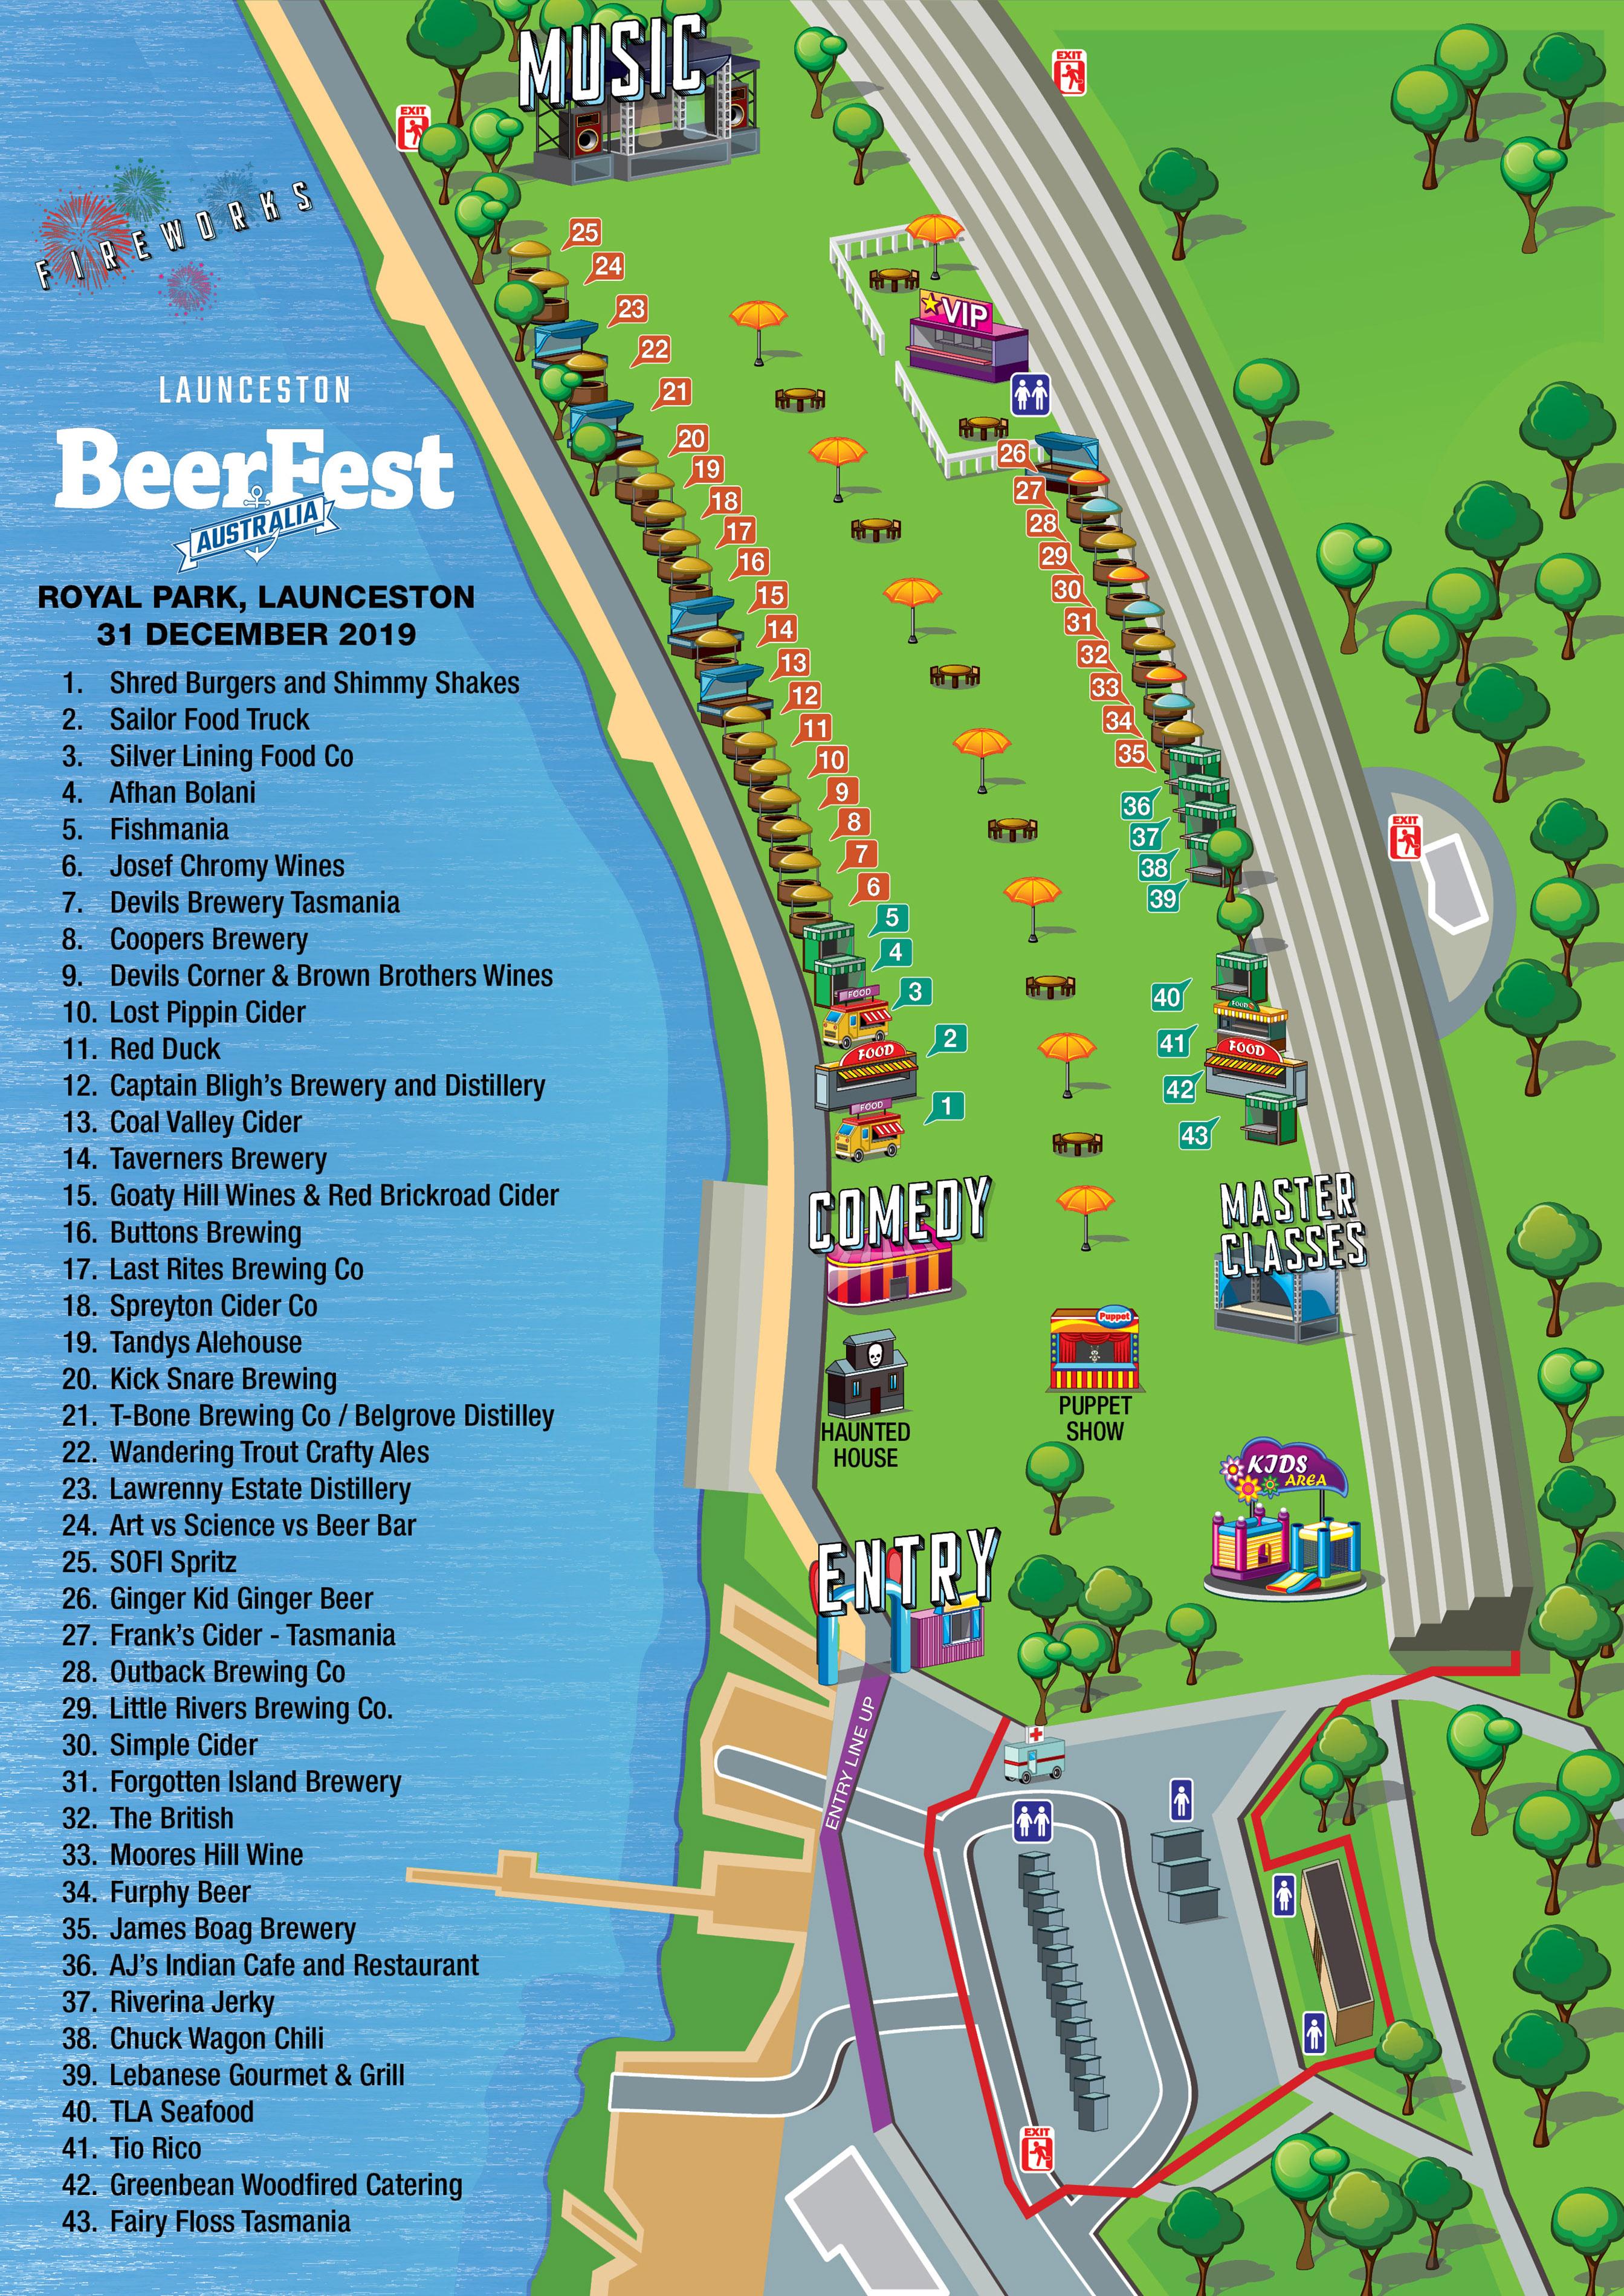 Launceston BeerFest 2019 Festival Map